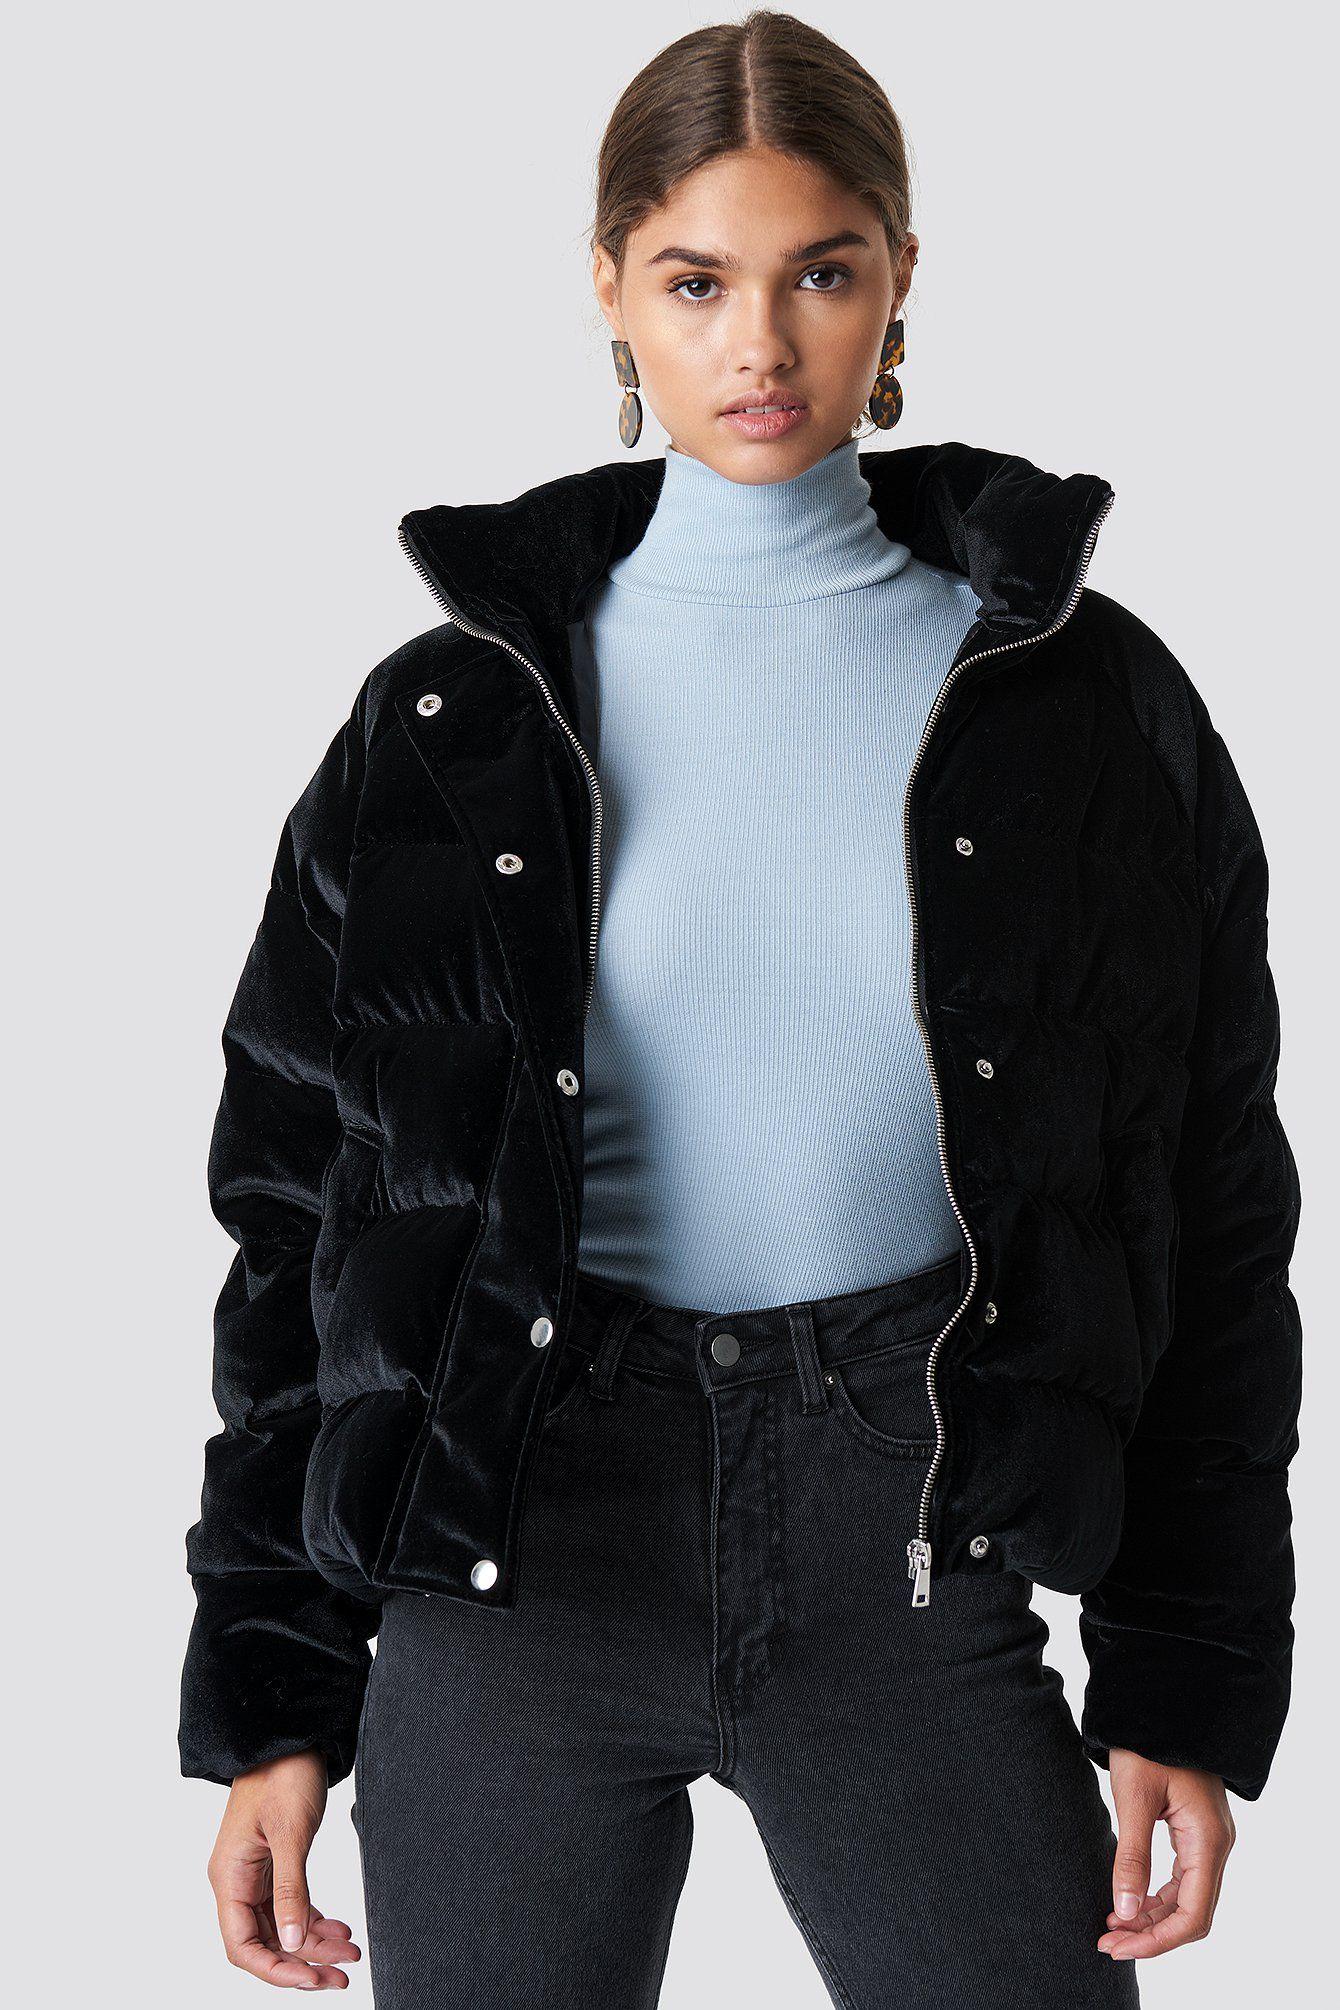 Na Kd Velvet Puffer Black Affiliate Link Stylische Puffer Jacke Wintermode Winterjacke Fashion Winte Puffer Jacket Outfit Black Jacket Outfit Fashion [ 2010 x 1340 Pixel ]